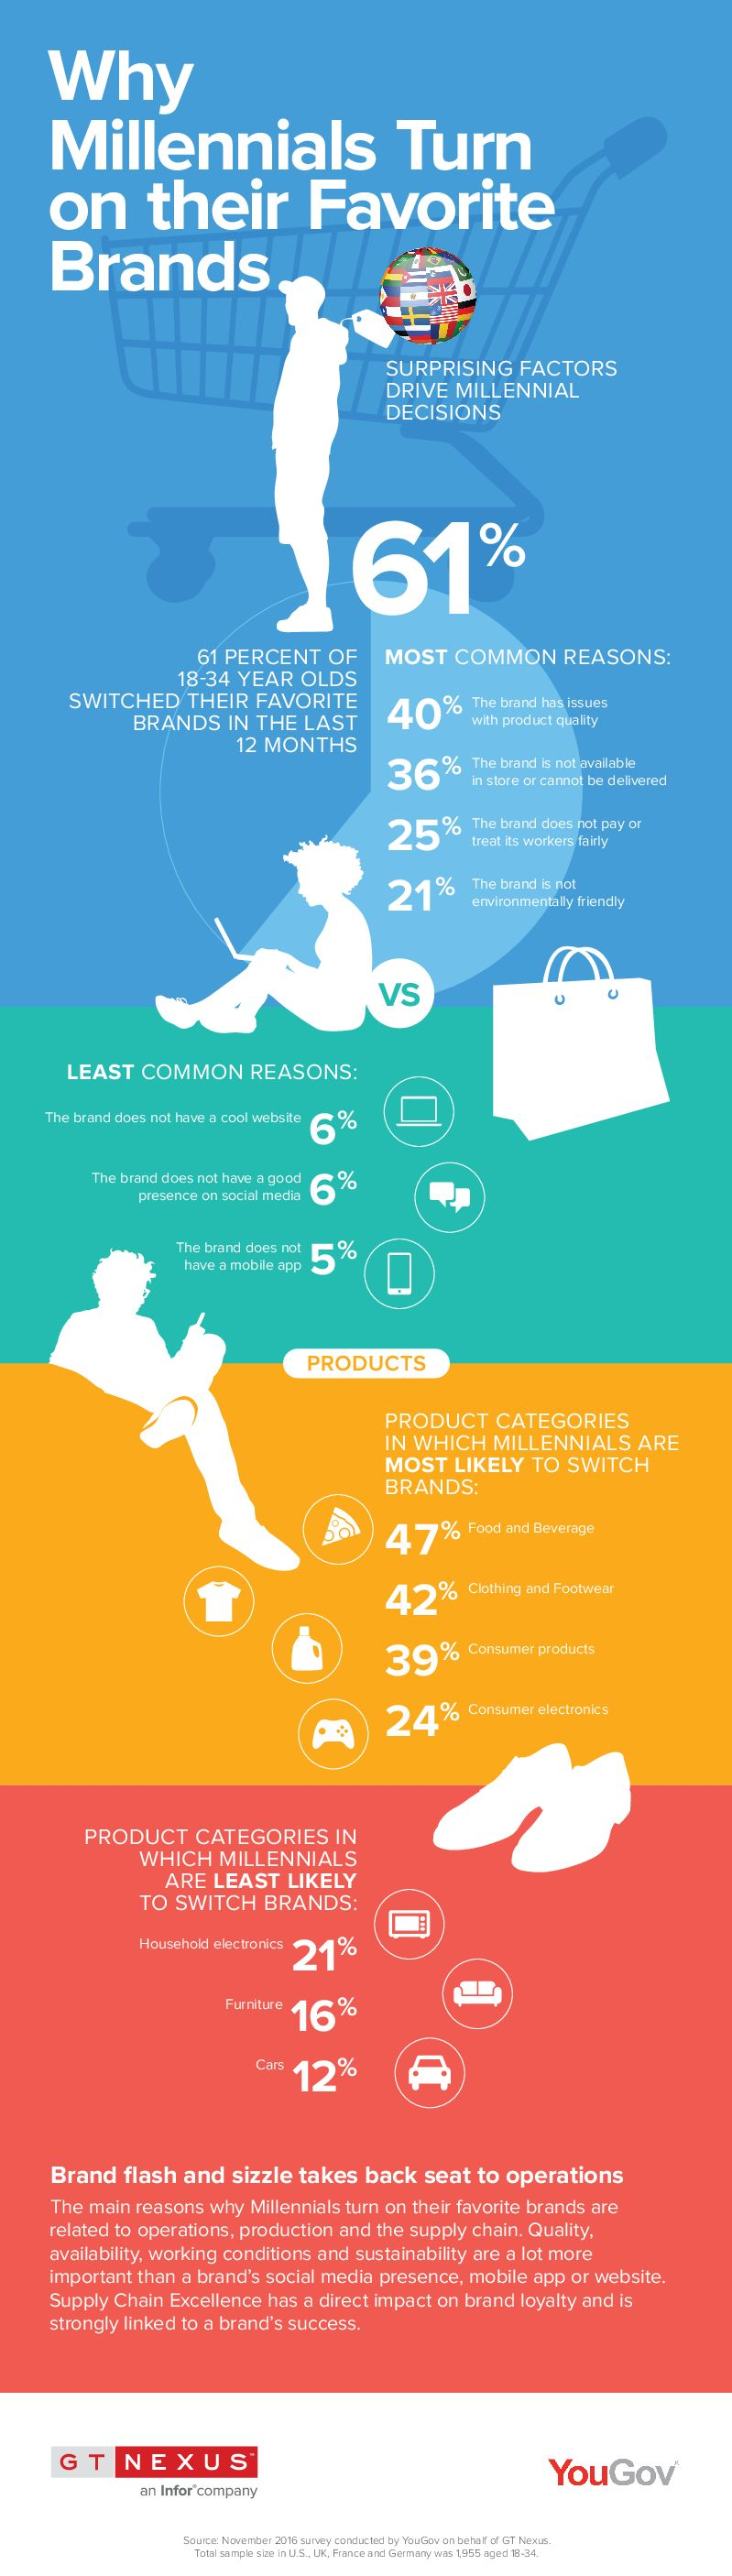 Brand loyalty factors for millennials